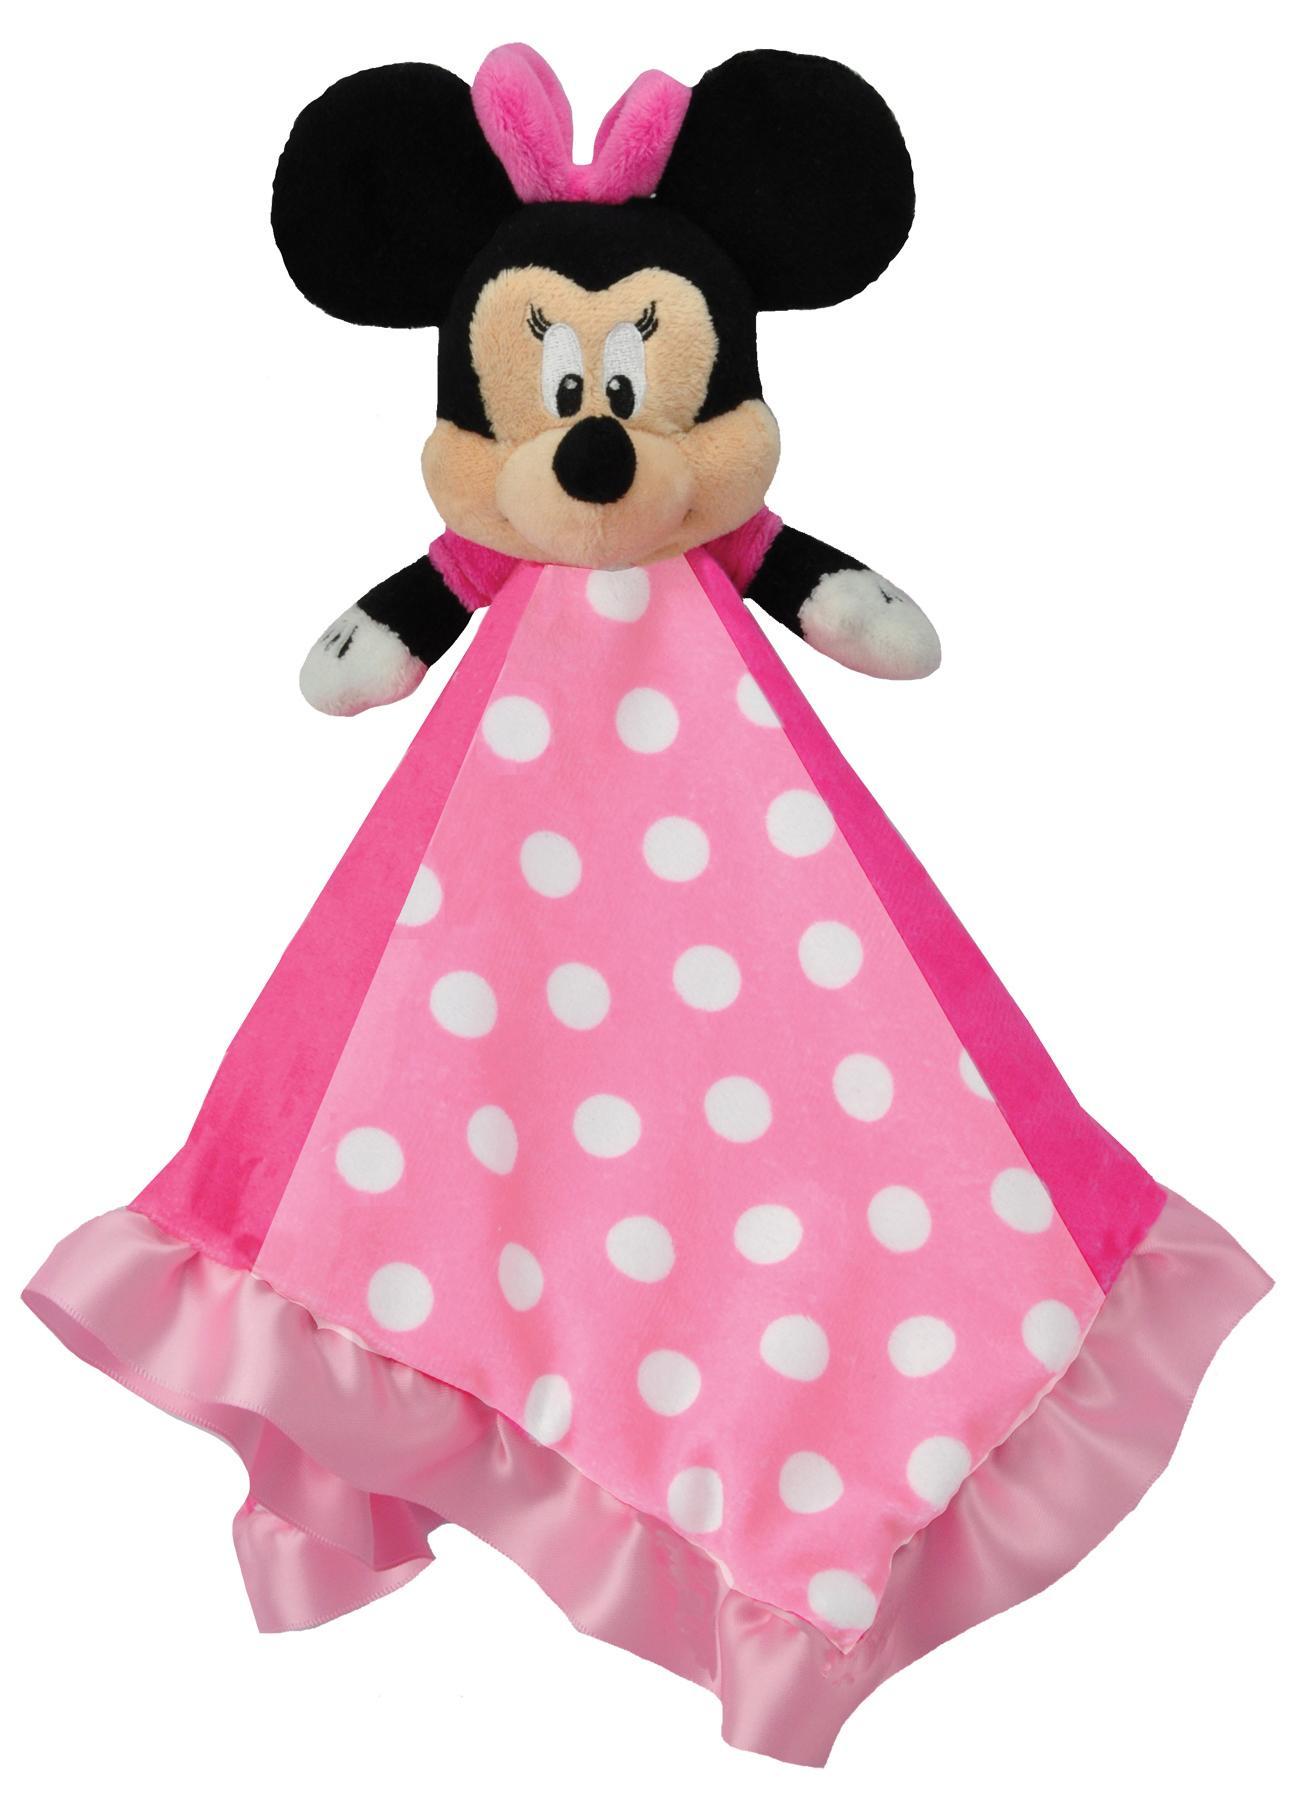 Disney Minnie Mouse Plush Toy Baby Blanket